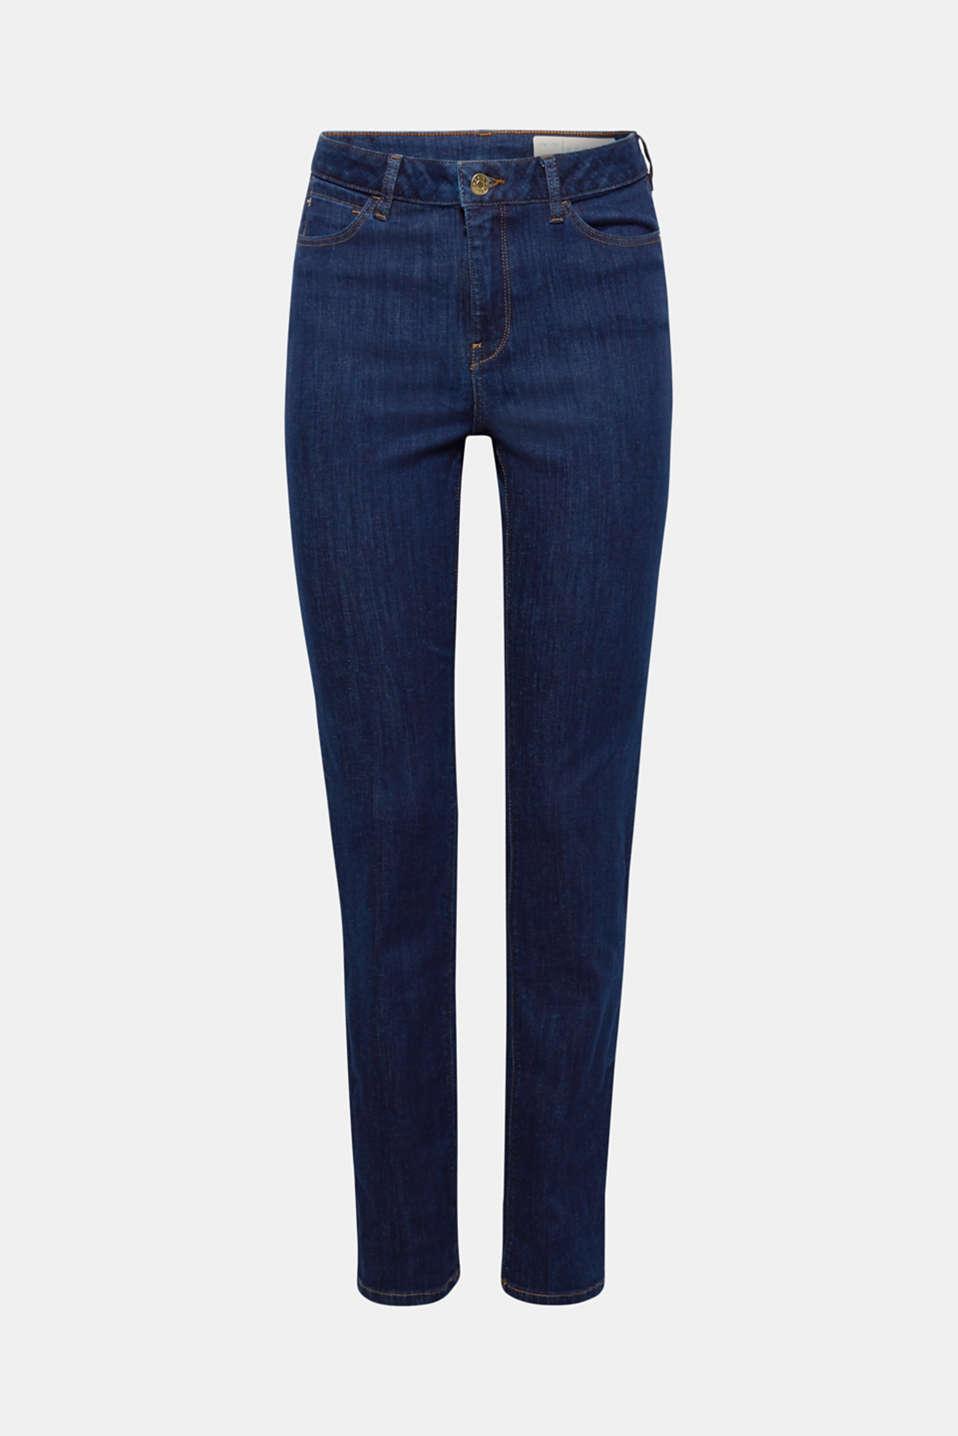 Pants denim, BLUE RINSE, detail image number 7